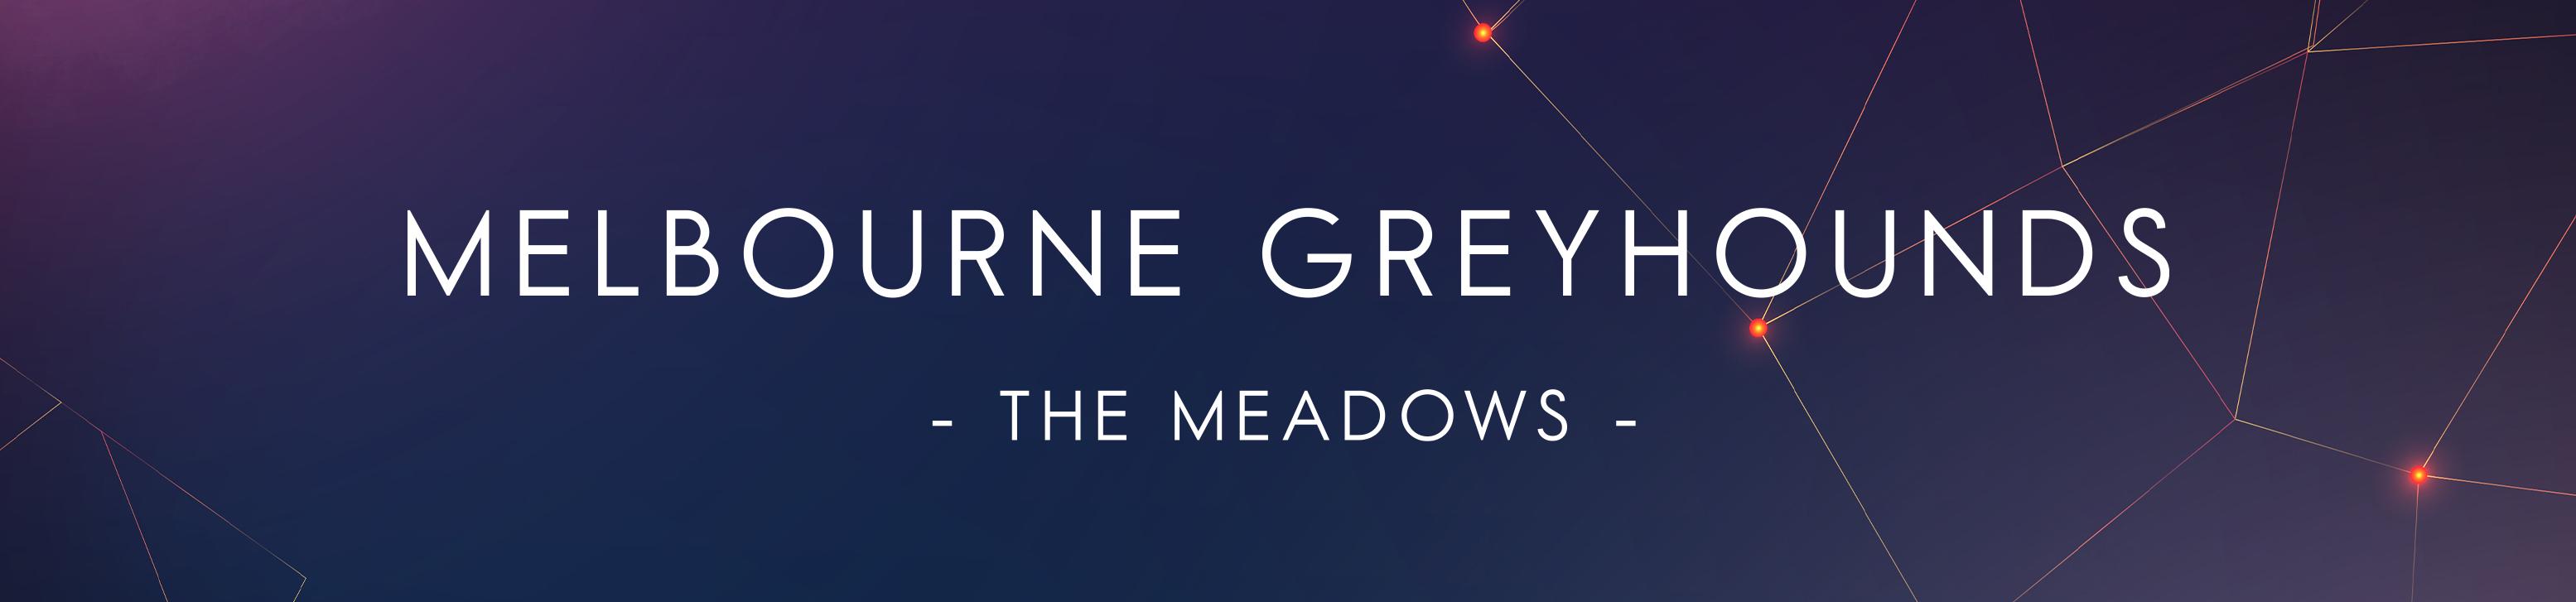 Melbourne Greyhounds footer